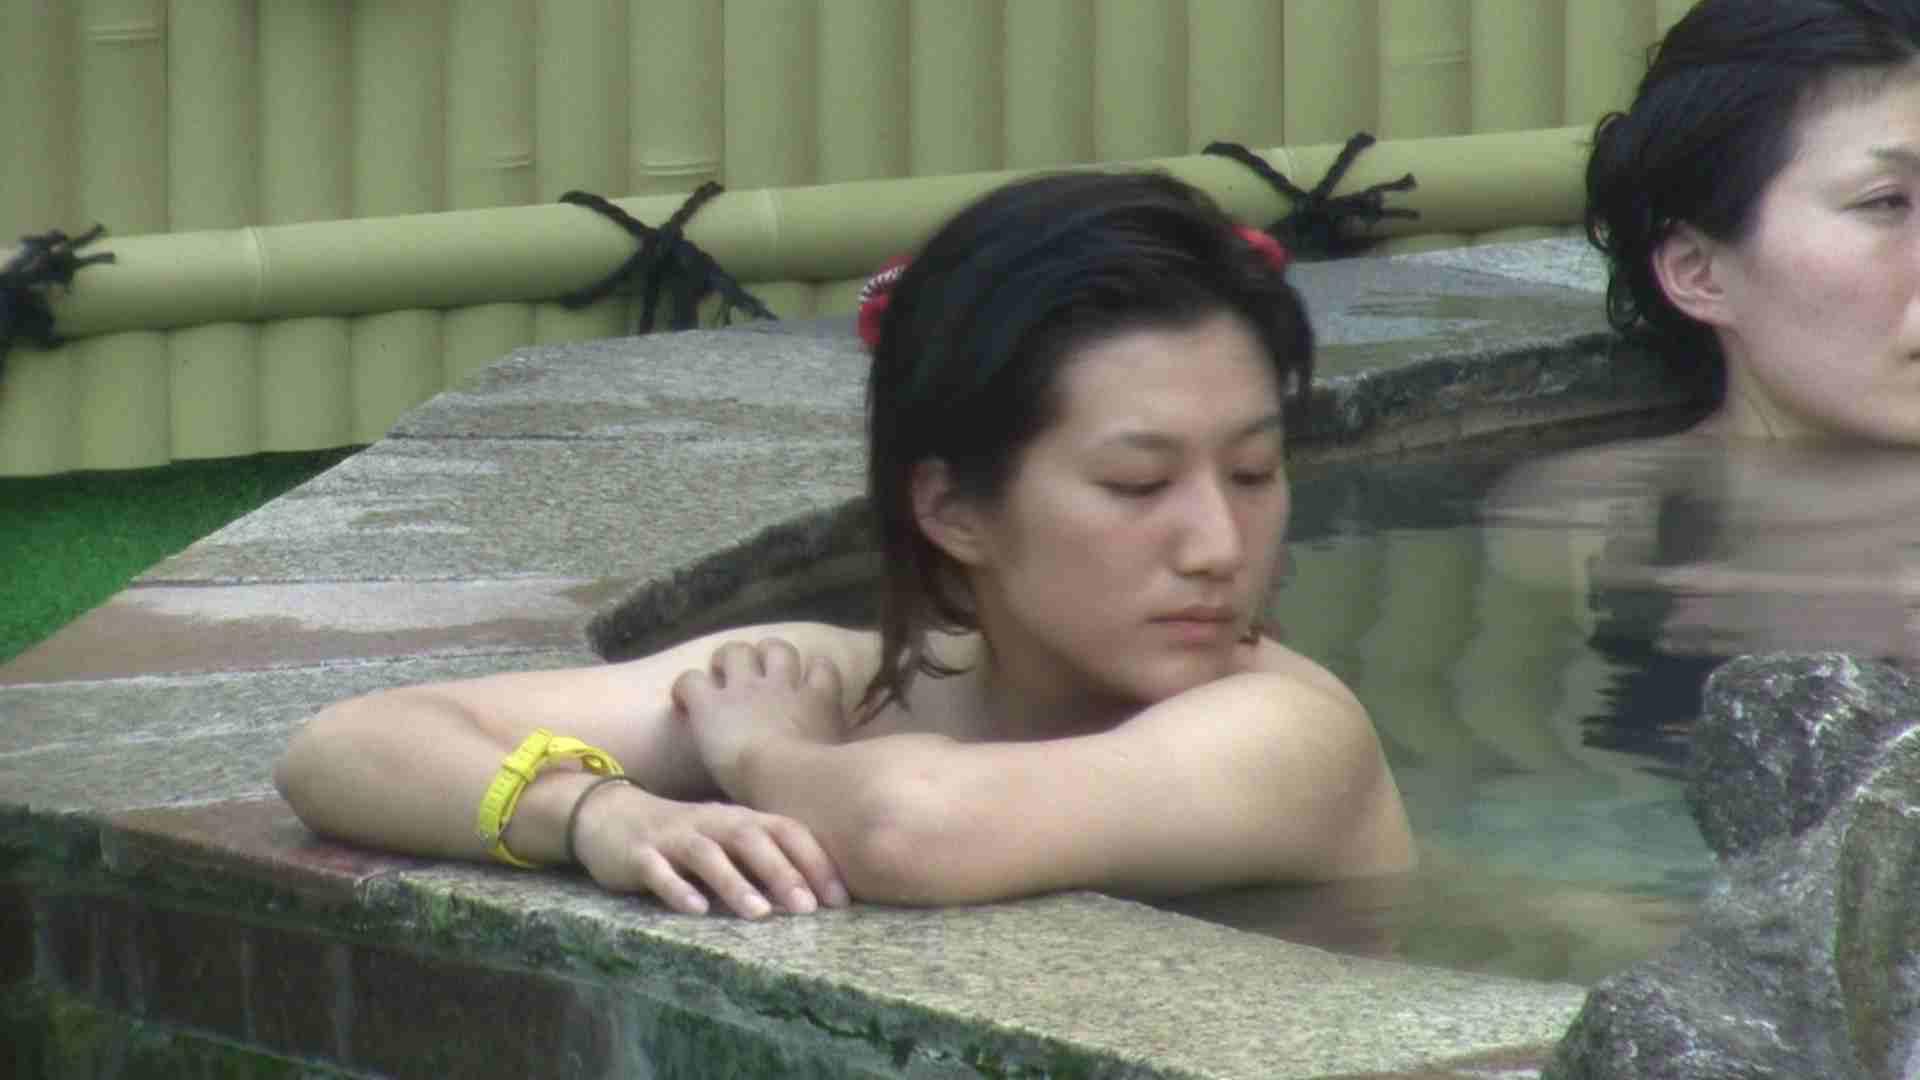 Aquaな露天風呂Vol.132 0 | 0  61連発 51